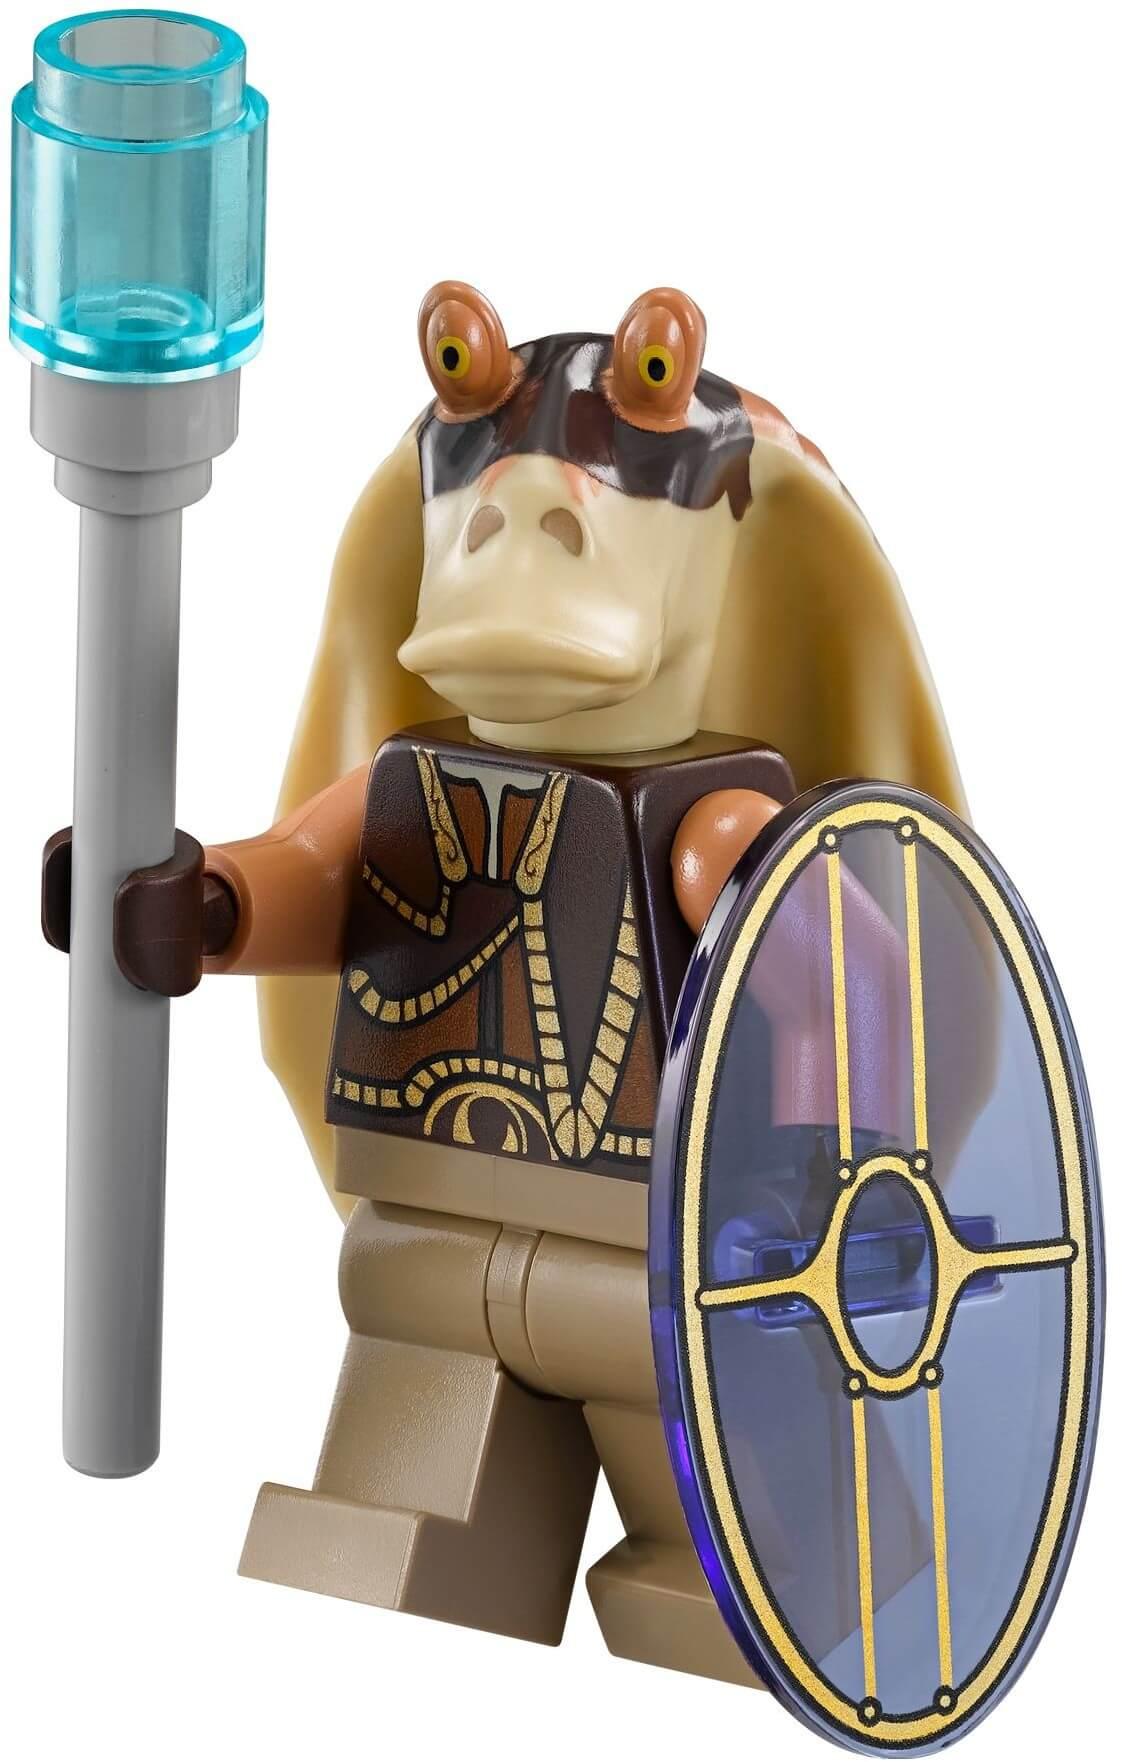 Mua đồ chơi LEGO 75086 - LEGO Star Wars 75086 - Xe Chở Lính của Binh Đoàn Droid (LEGO Star Wars Battle Droid Troop Carrier 75086)